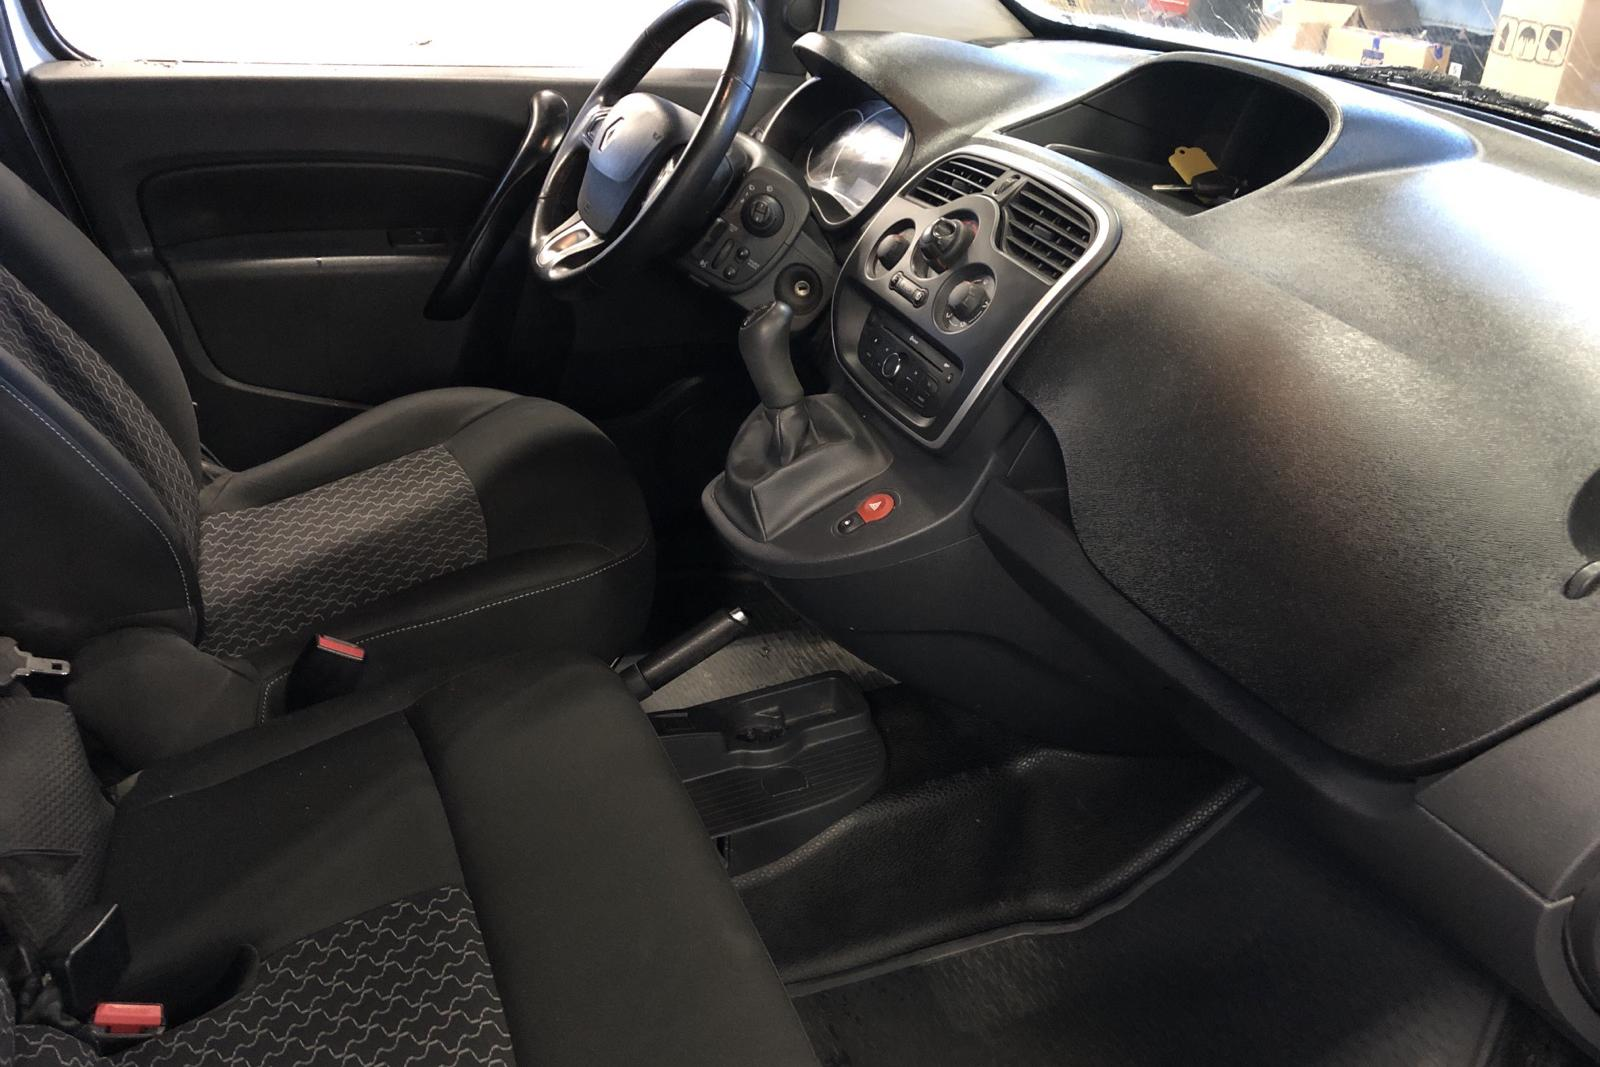 Renault Kangoo 1.5 dCi Maxi skåp (90hk) - 6 467 mil - Manuell - vit - 2017